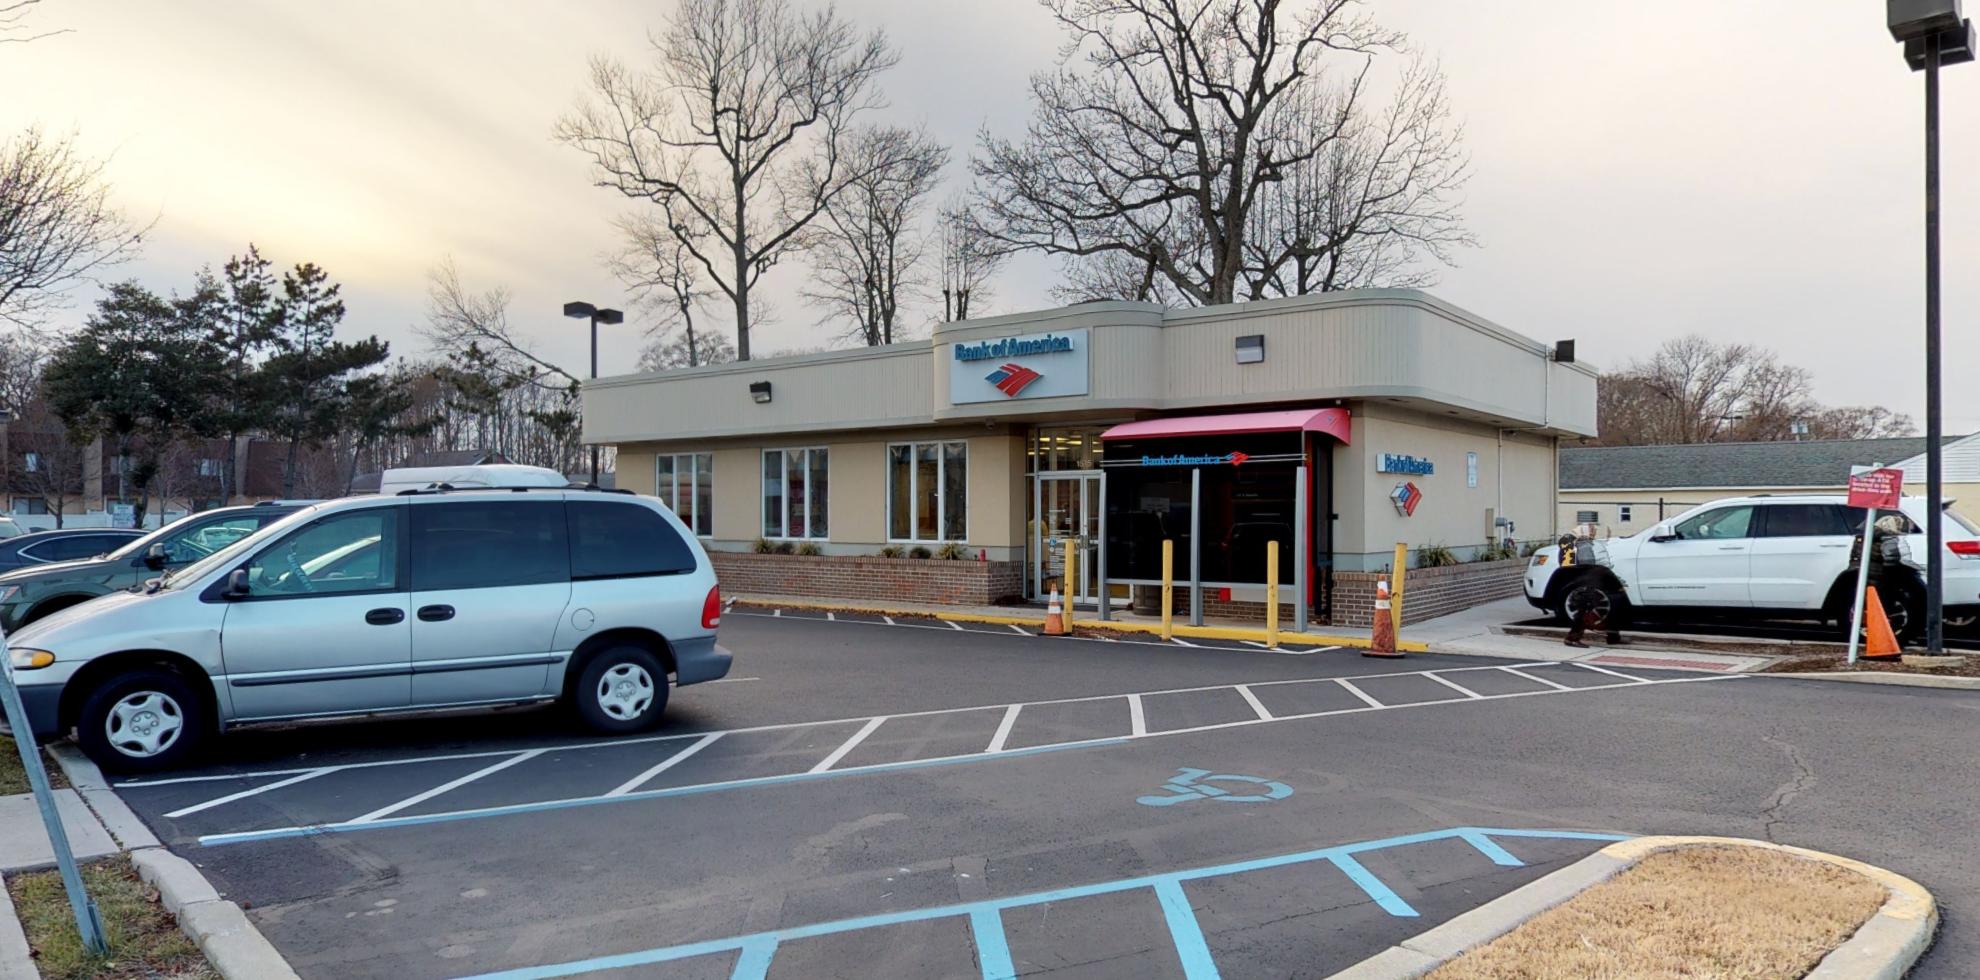 Bank of America financial center with drive-thru ATM   1515 Wildwood Blvd, Rio Grande, NJ 08242